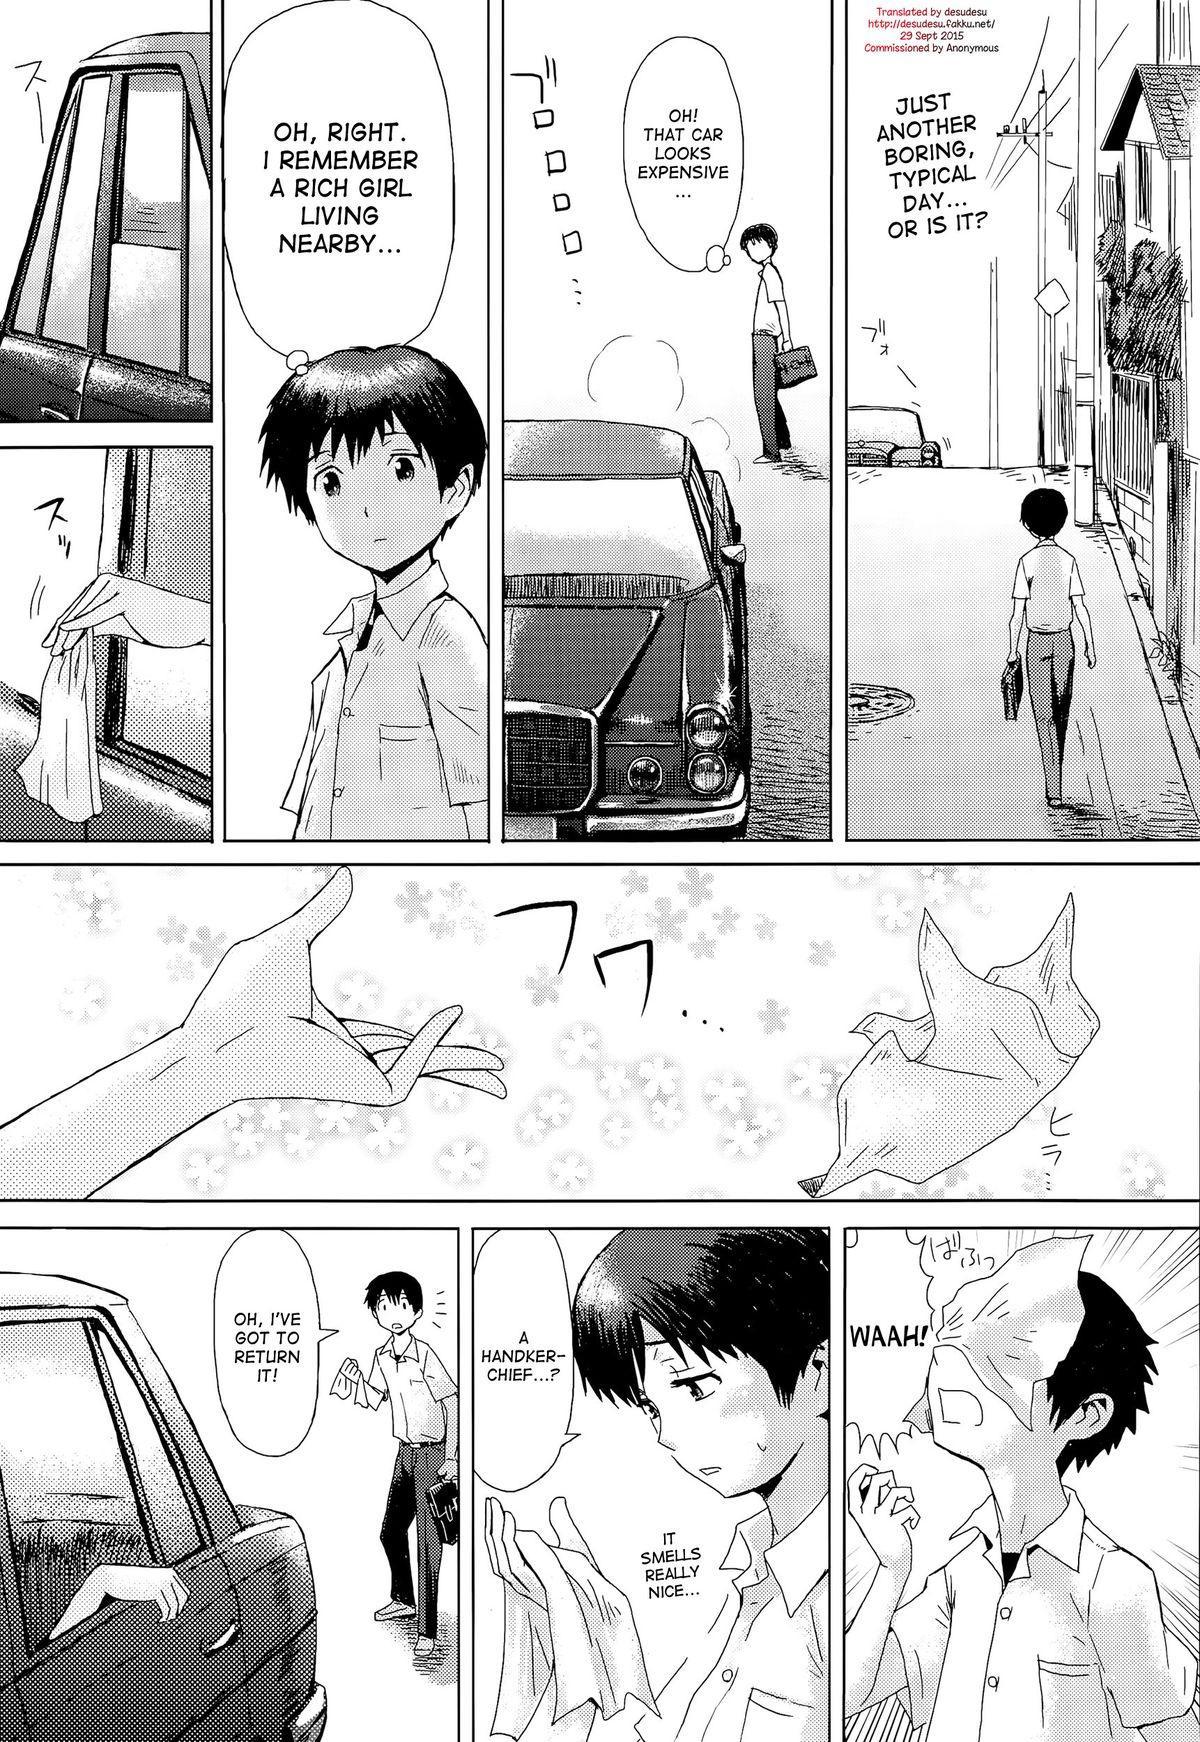 Young sex manga Uncensored Hentai